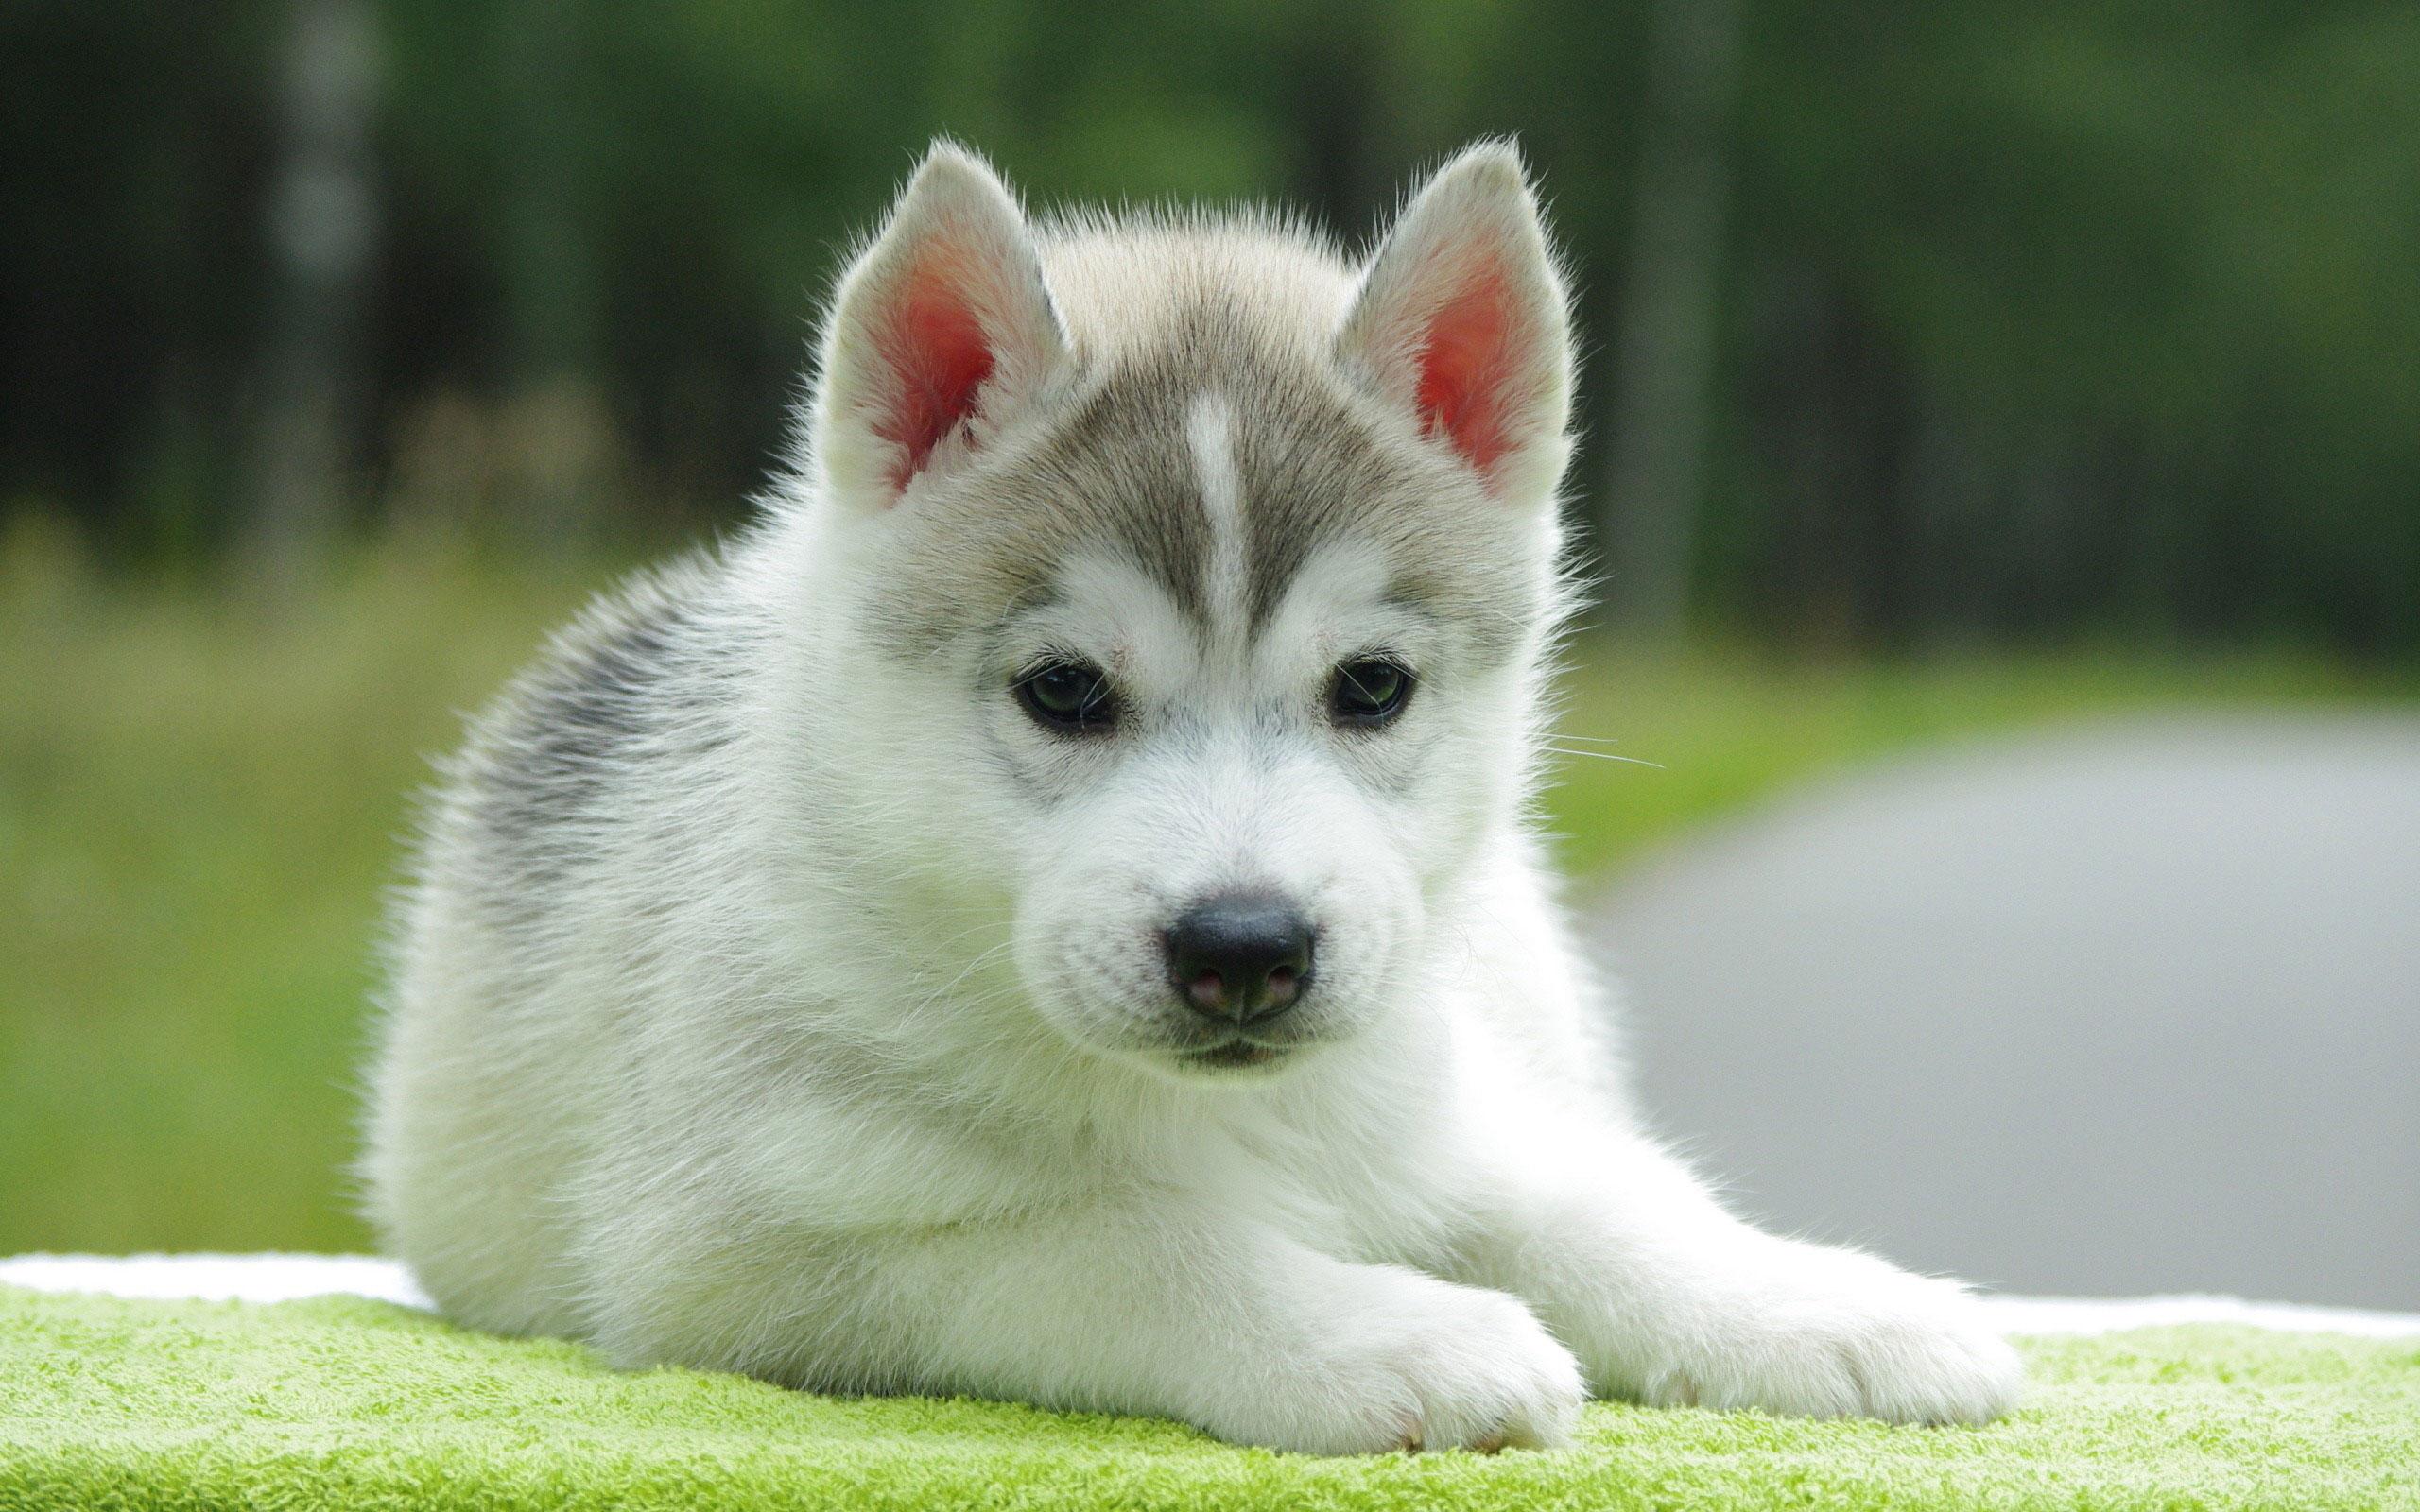 Puppy   Wallpapers Pictures Pics Photos Images Desktop 2560x1600